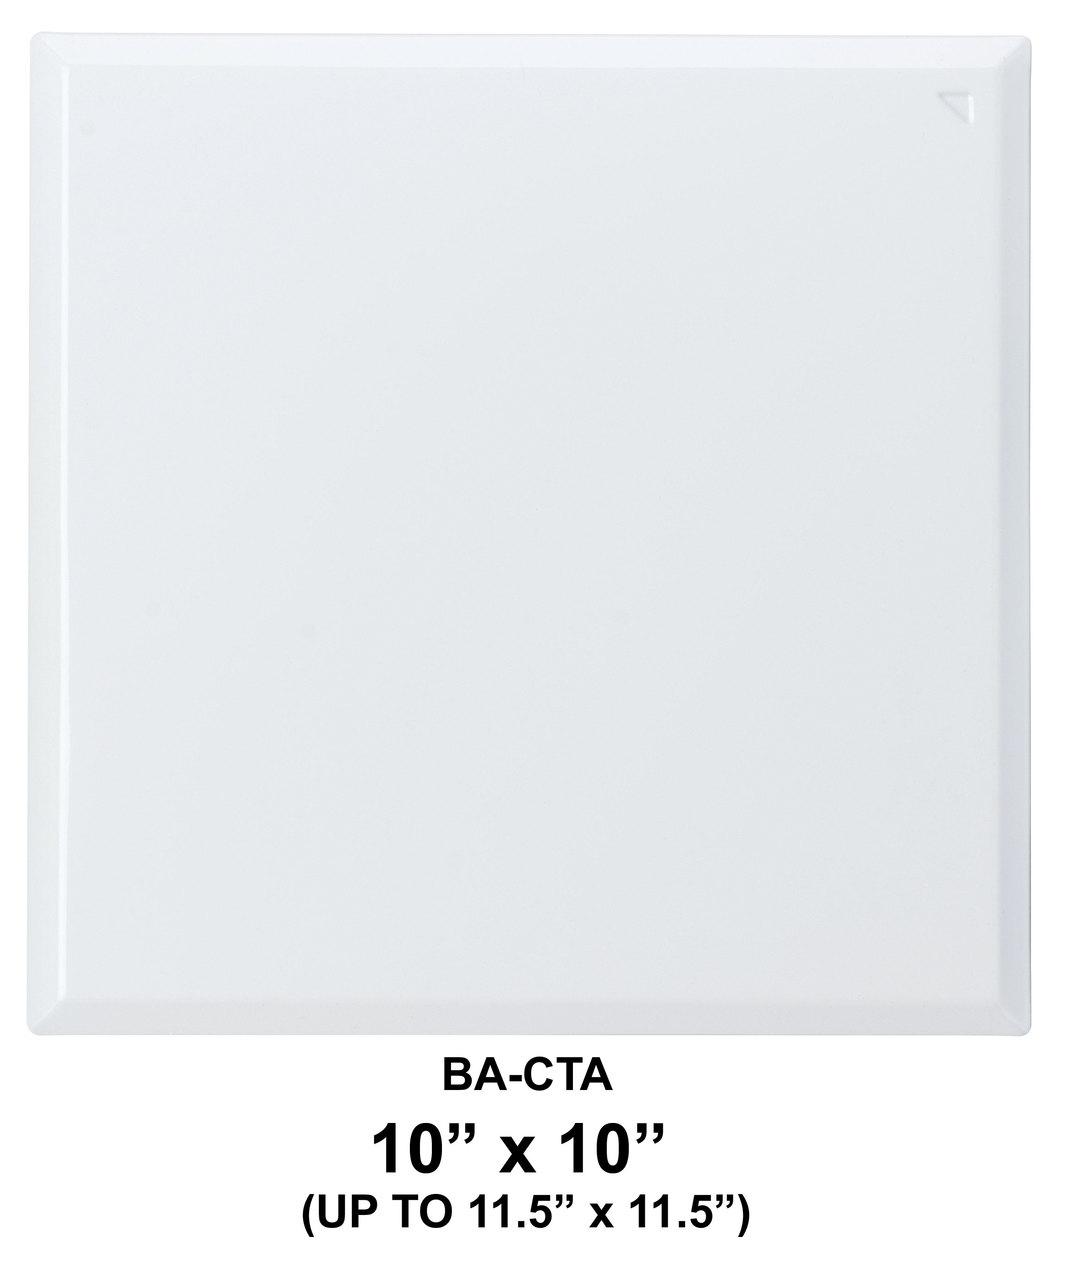 Access Panels 10 x 10 BA-CTA Removeable / Adjustable Access Door - BEST